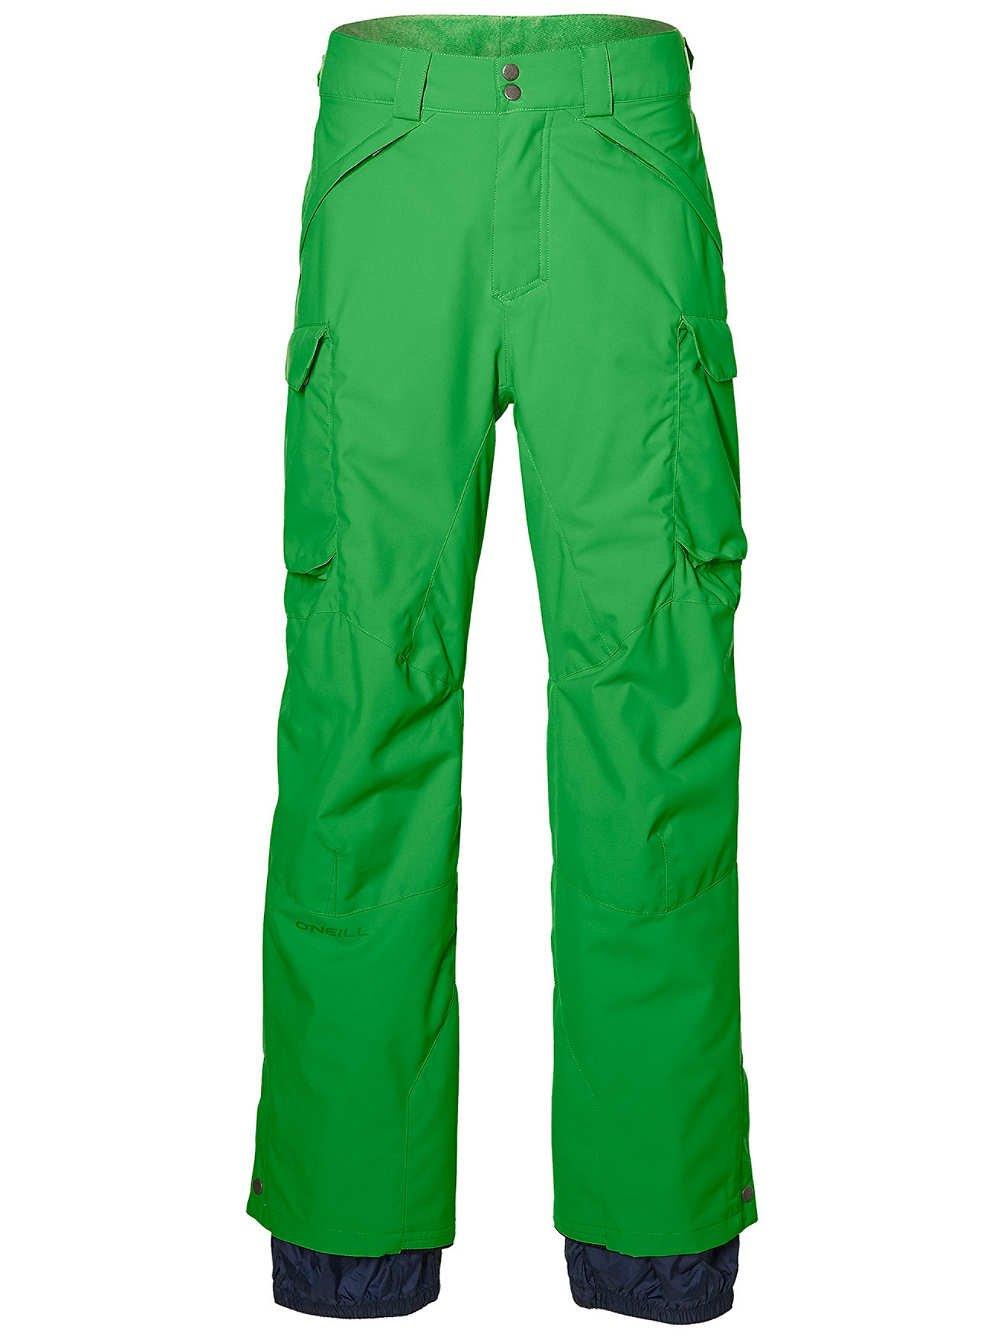 Treetop vert S O'Neill 8p3024 Pantalon Homme